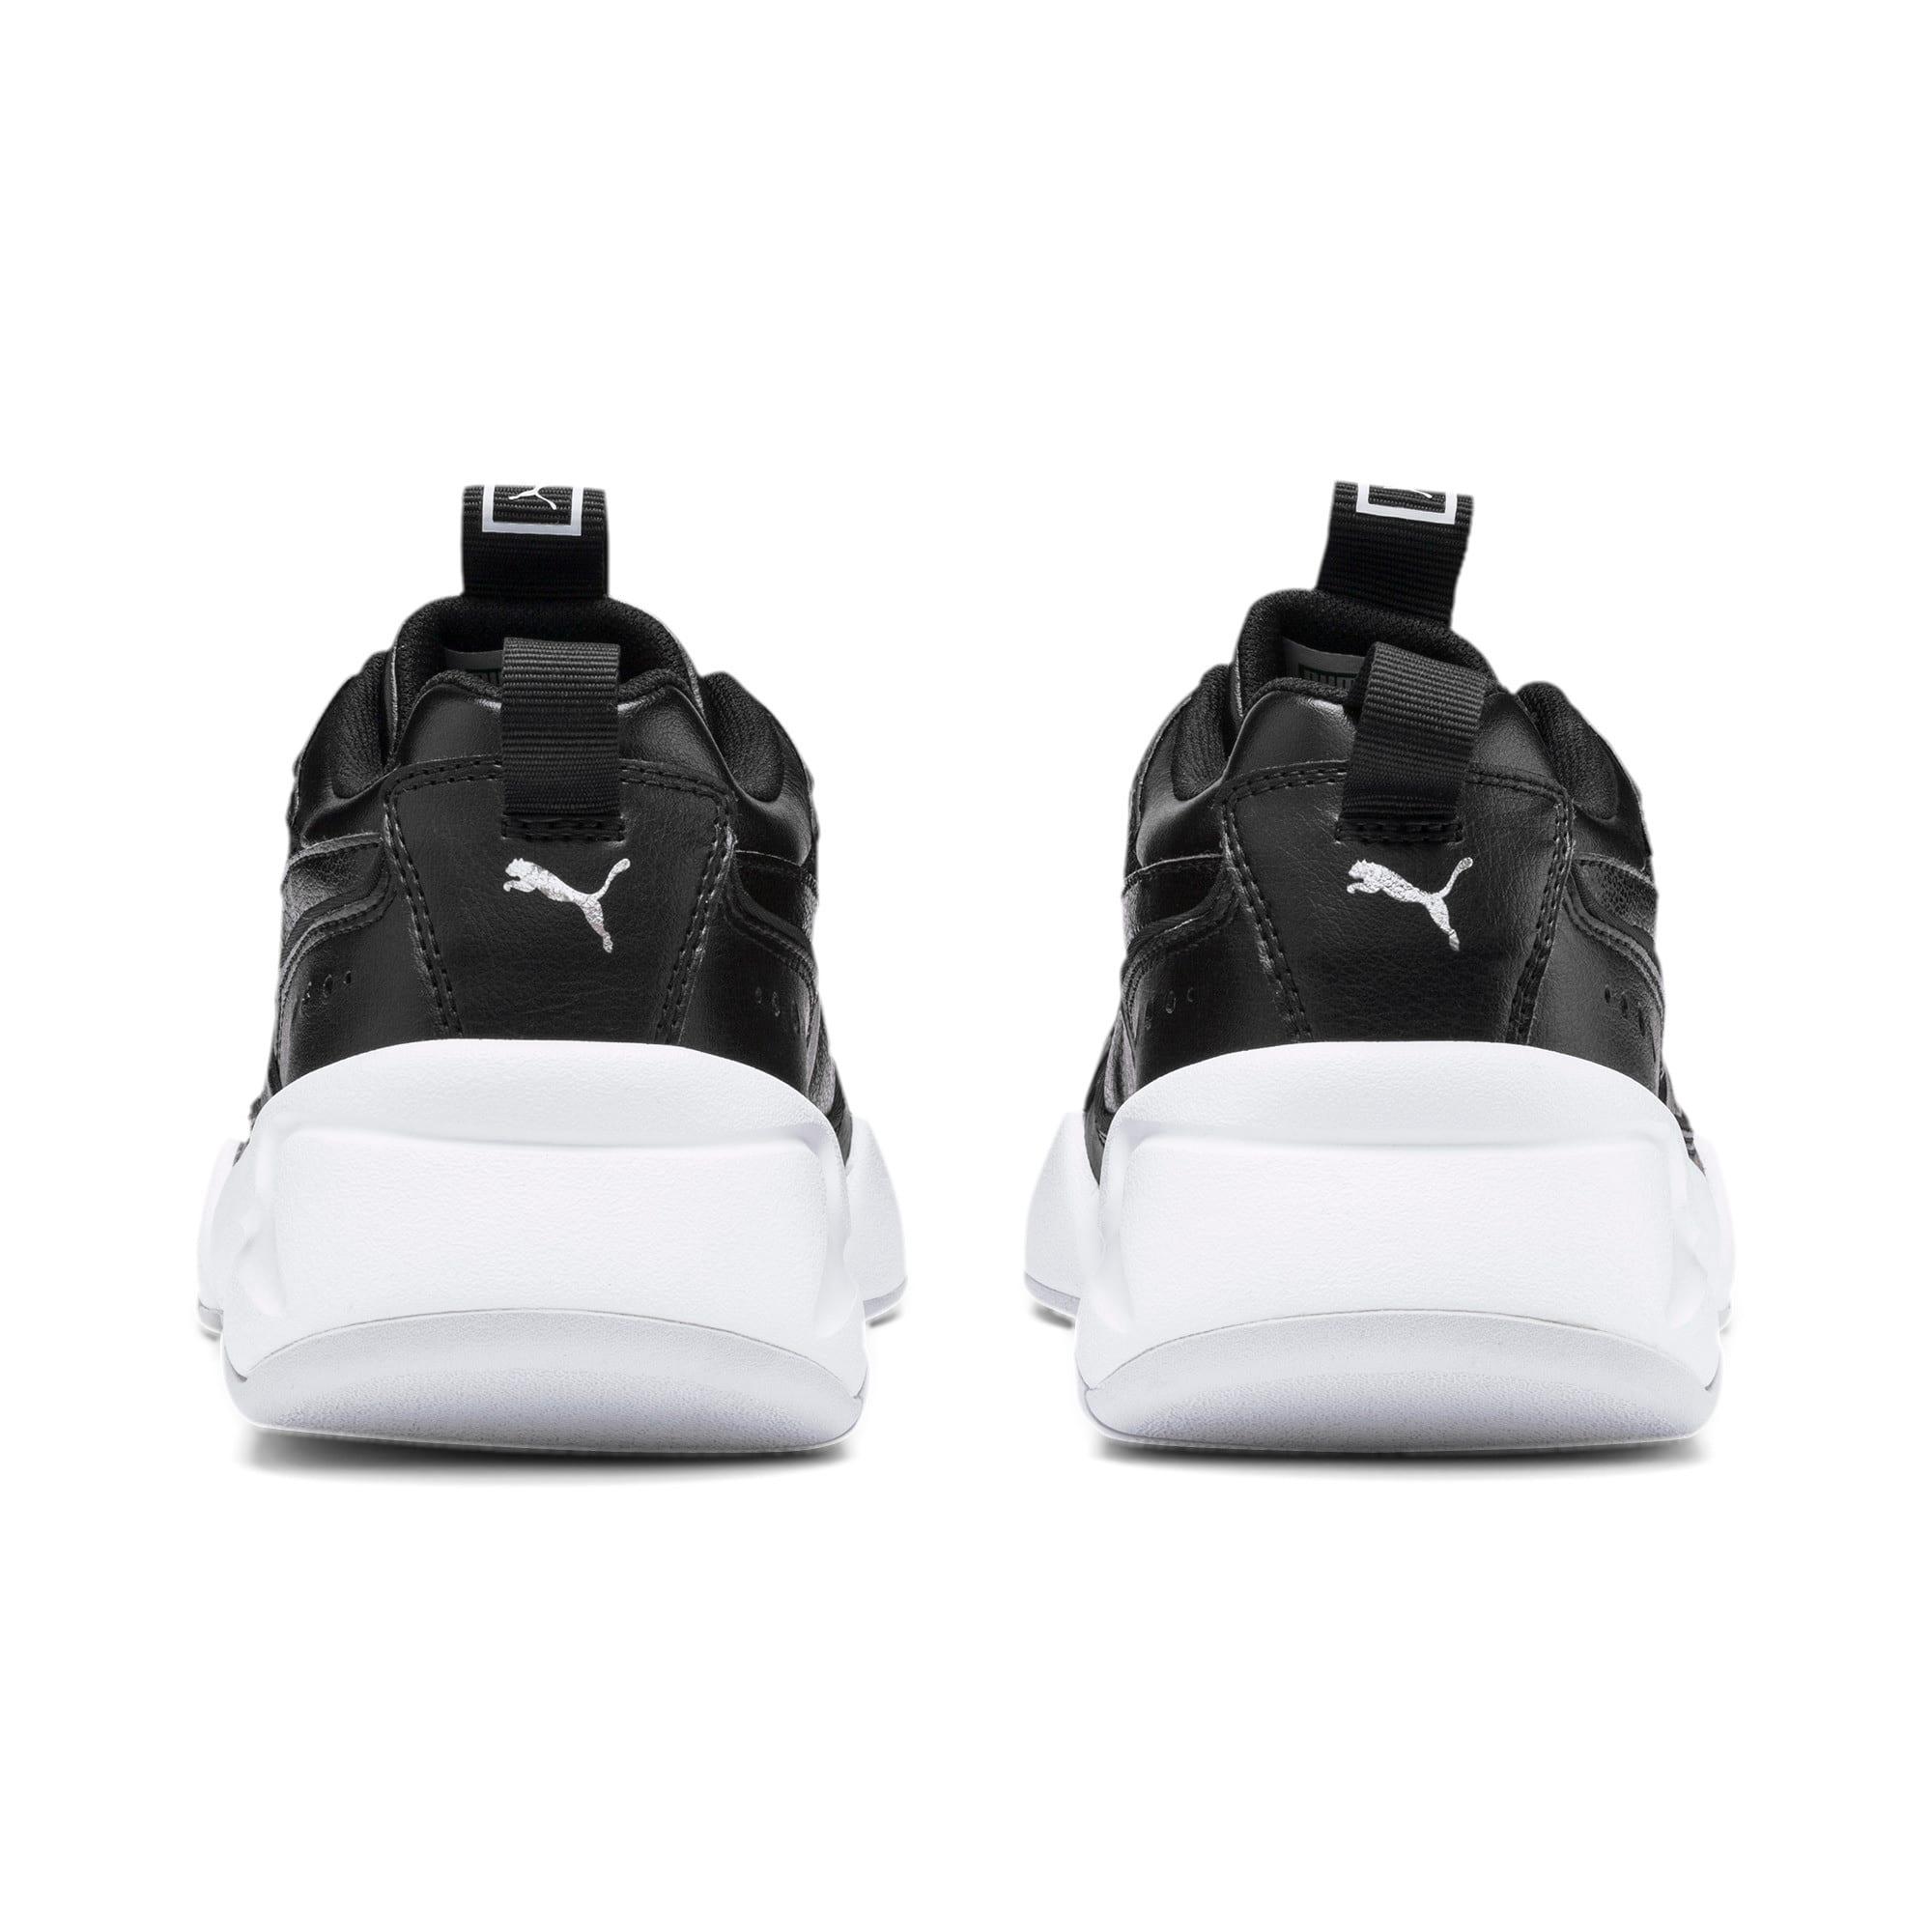 Thumbnail 4 of Nova 2 Women's Sneakers, Puma Black-Heather, medium